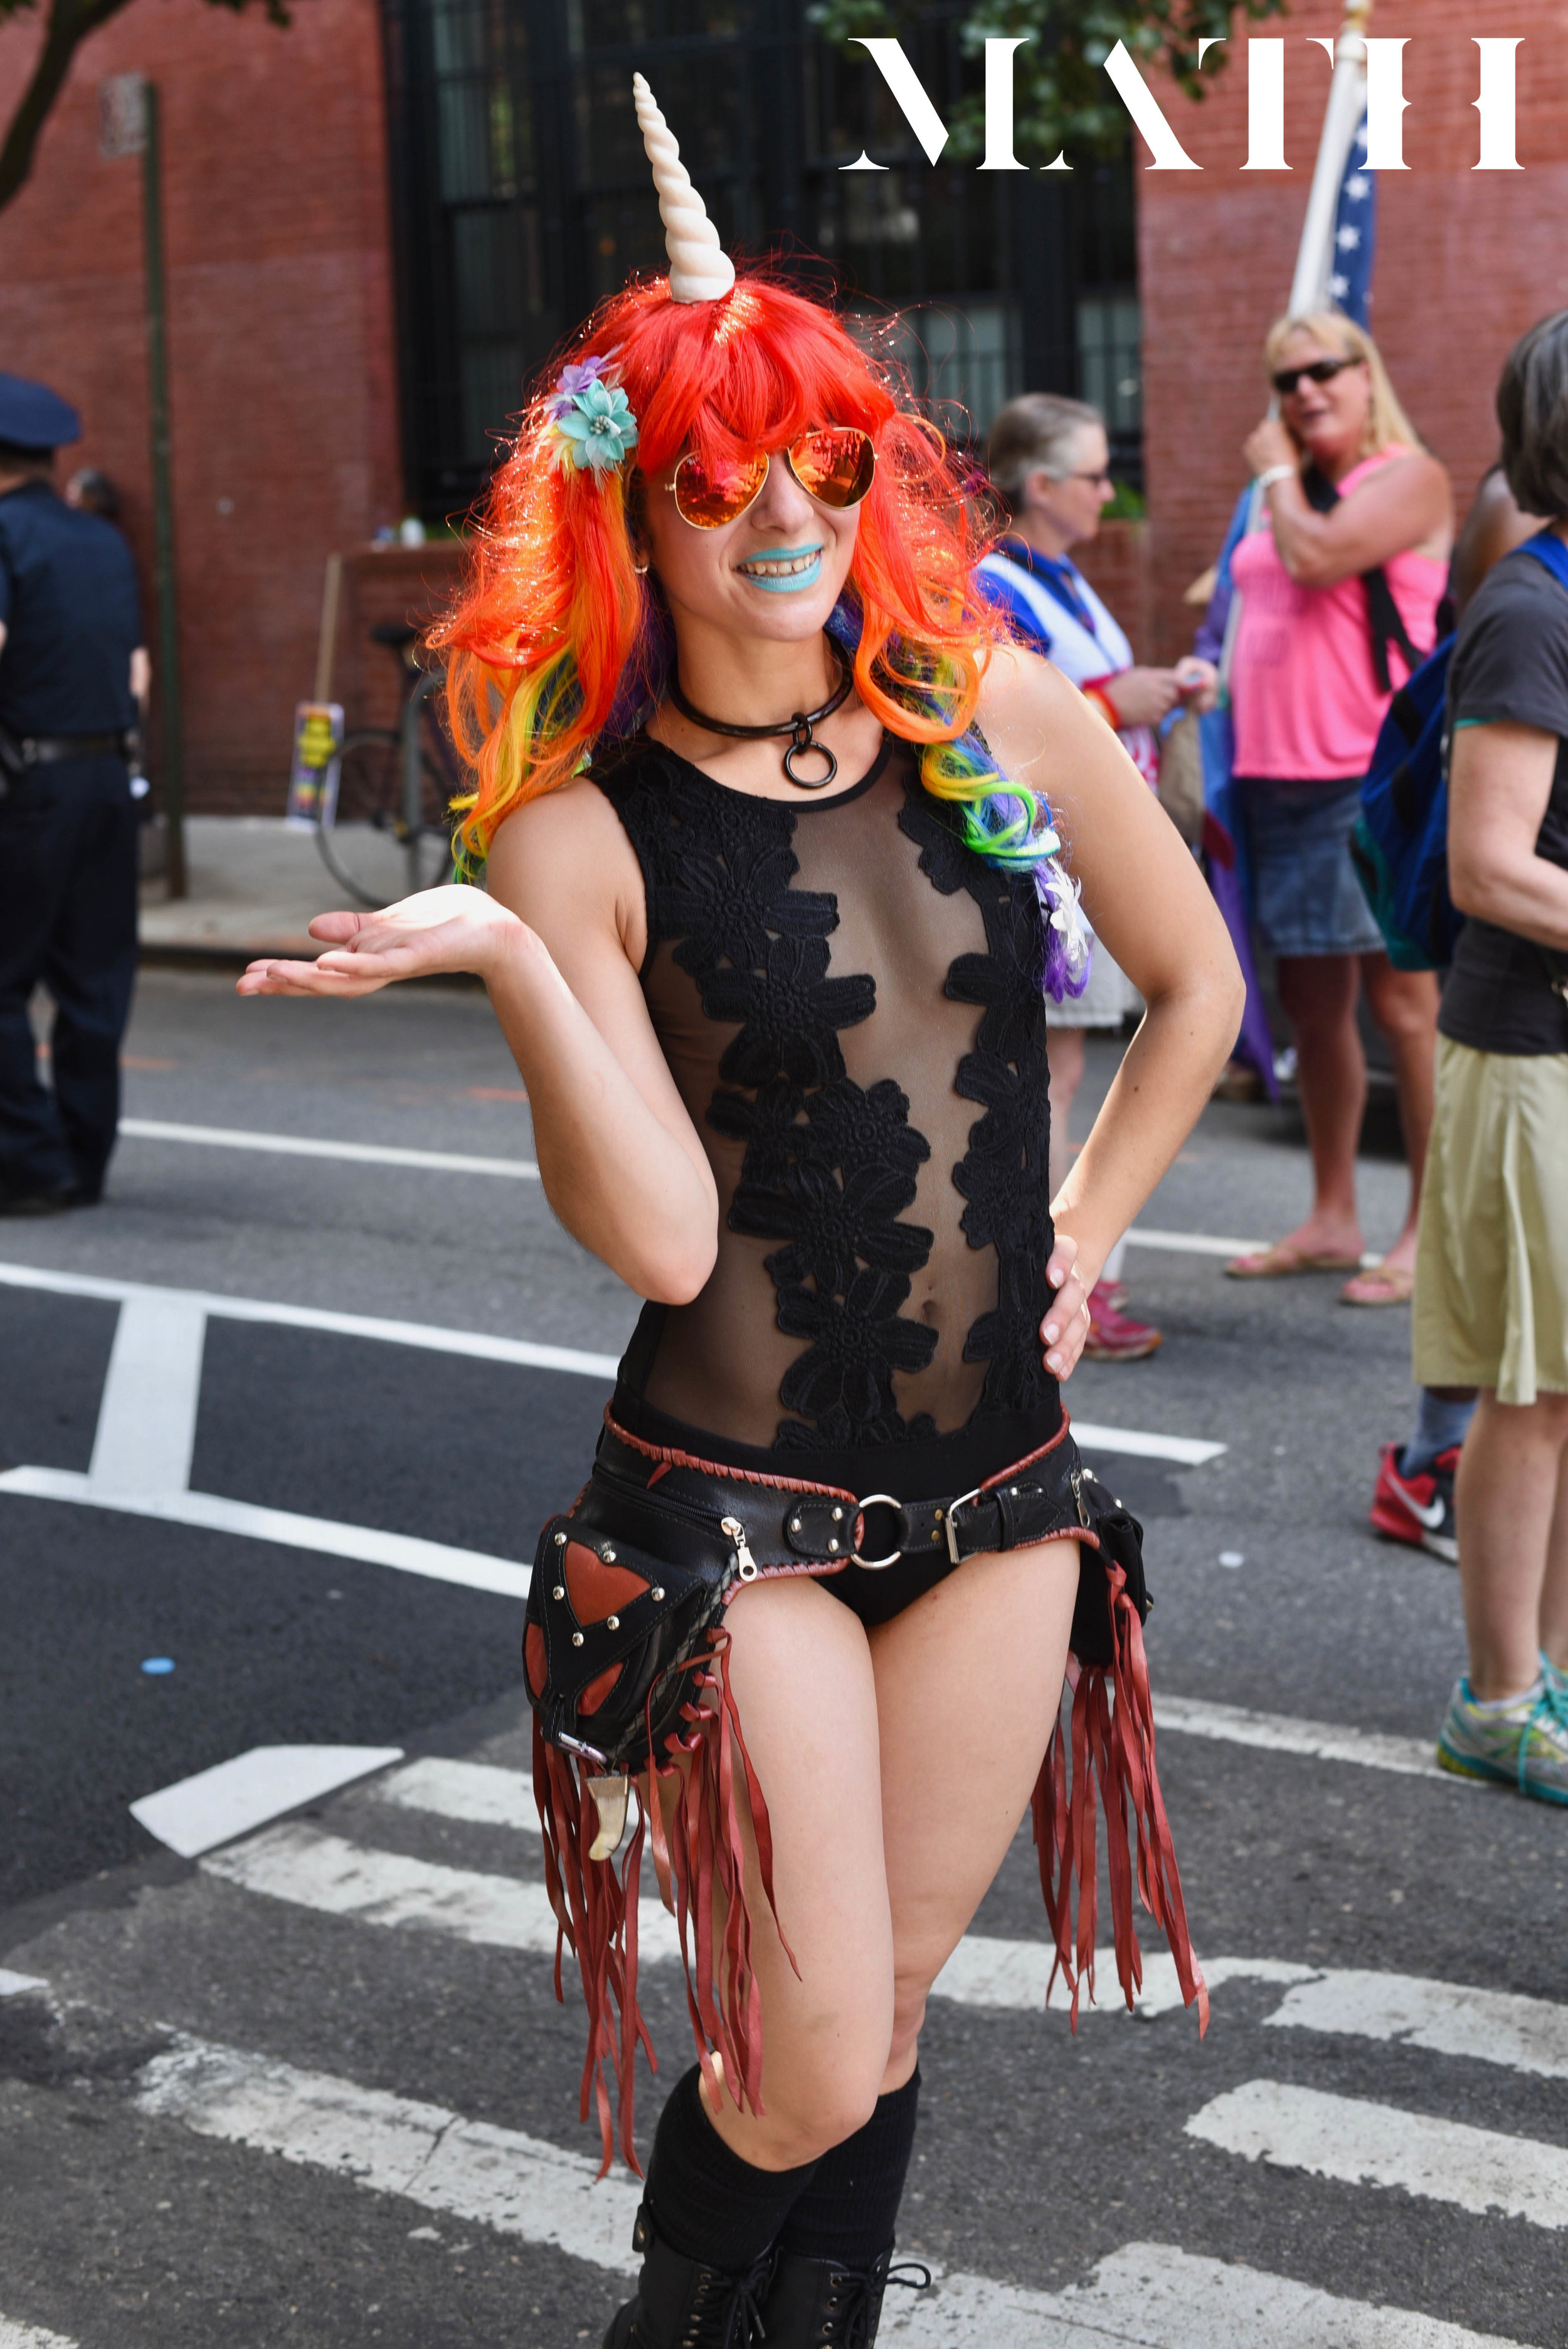 NYC Pride_Ginger Hollander 11.jpg